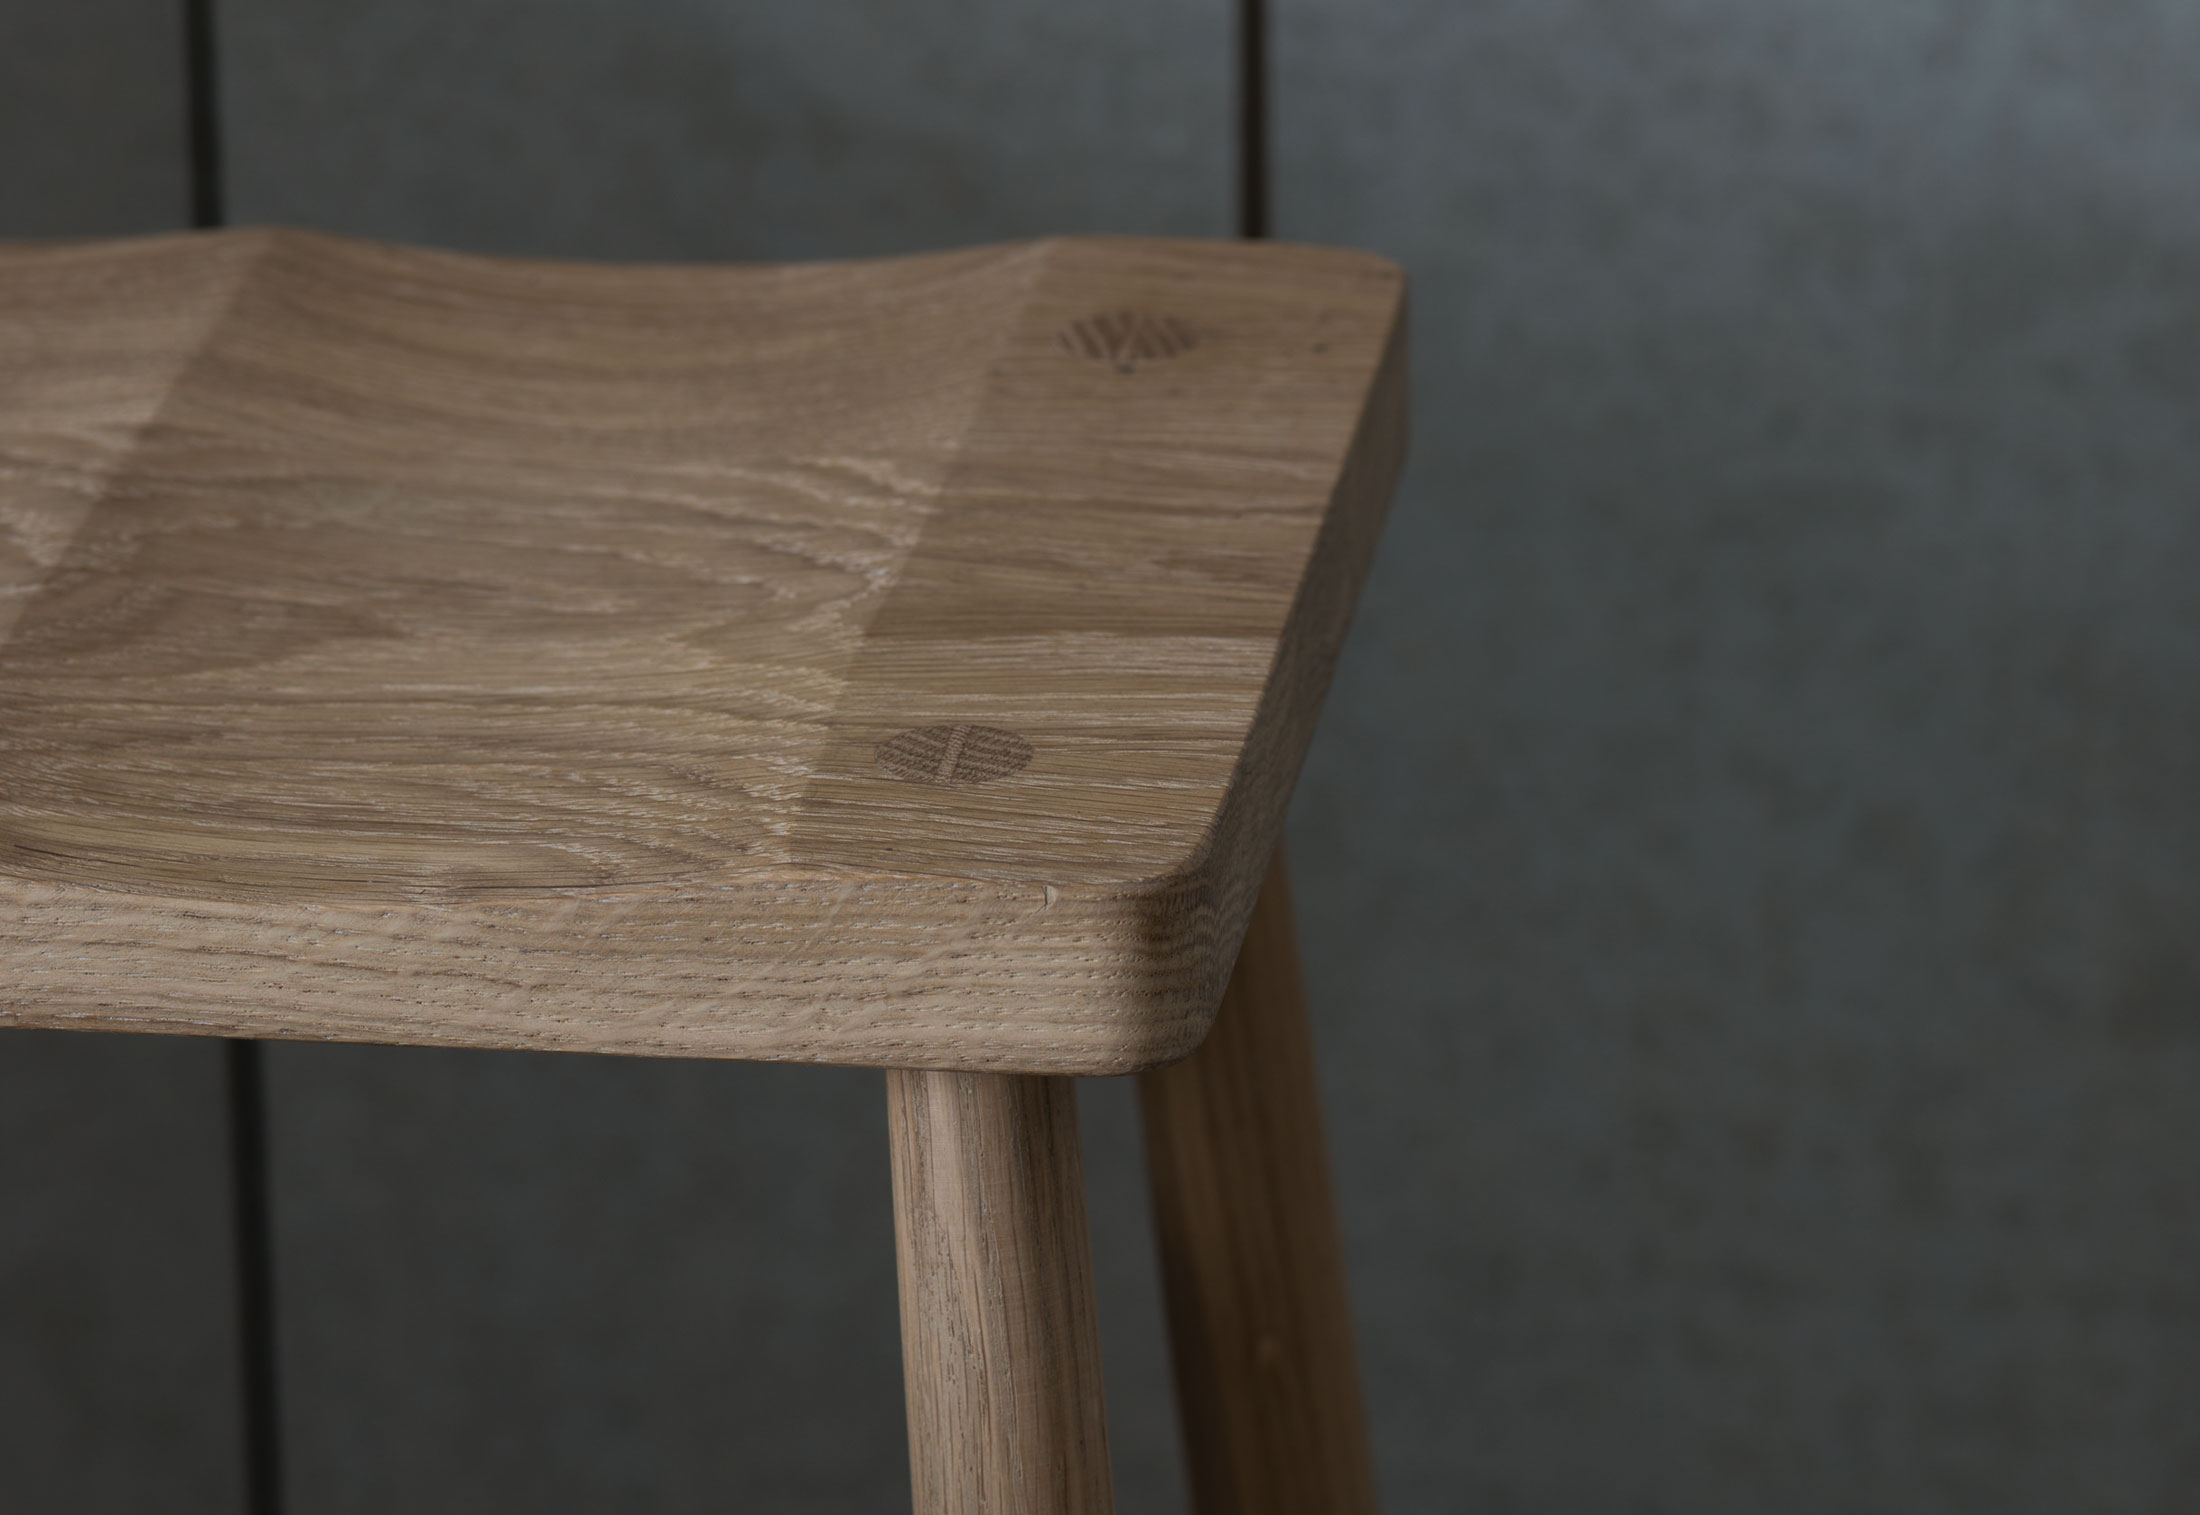 Surprising Imo Bar Stool By Pinch Stylepark Uwap Interior Chair Design Uwaporg